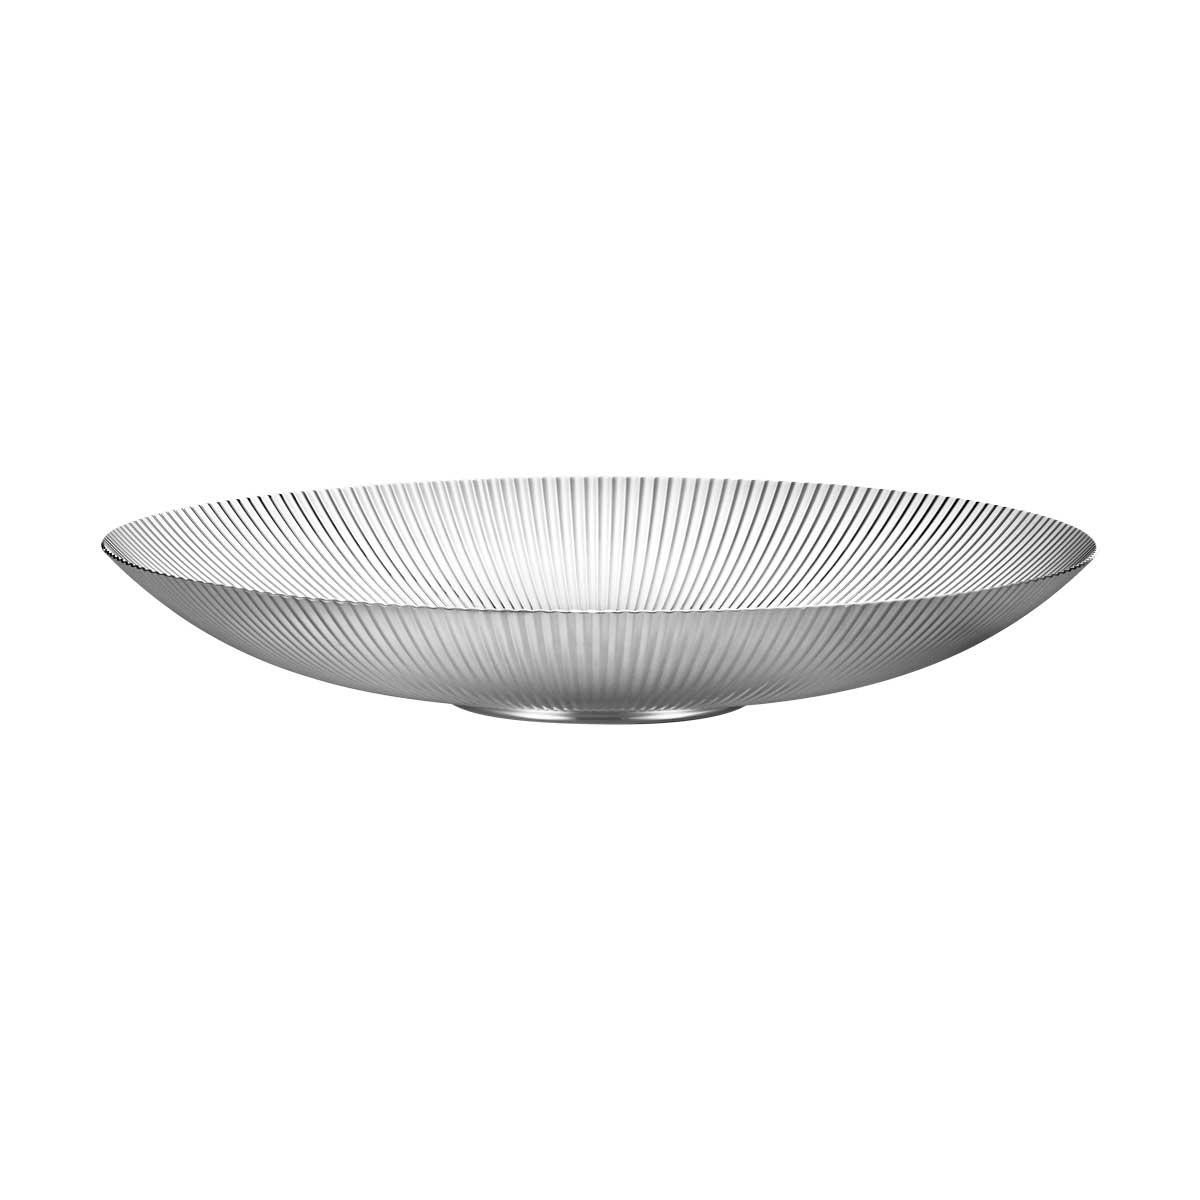 pack 10015893 BERNADOTTE low bowl stainless steel 320 mm